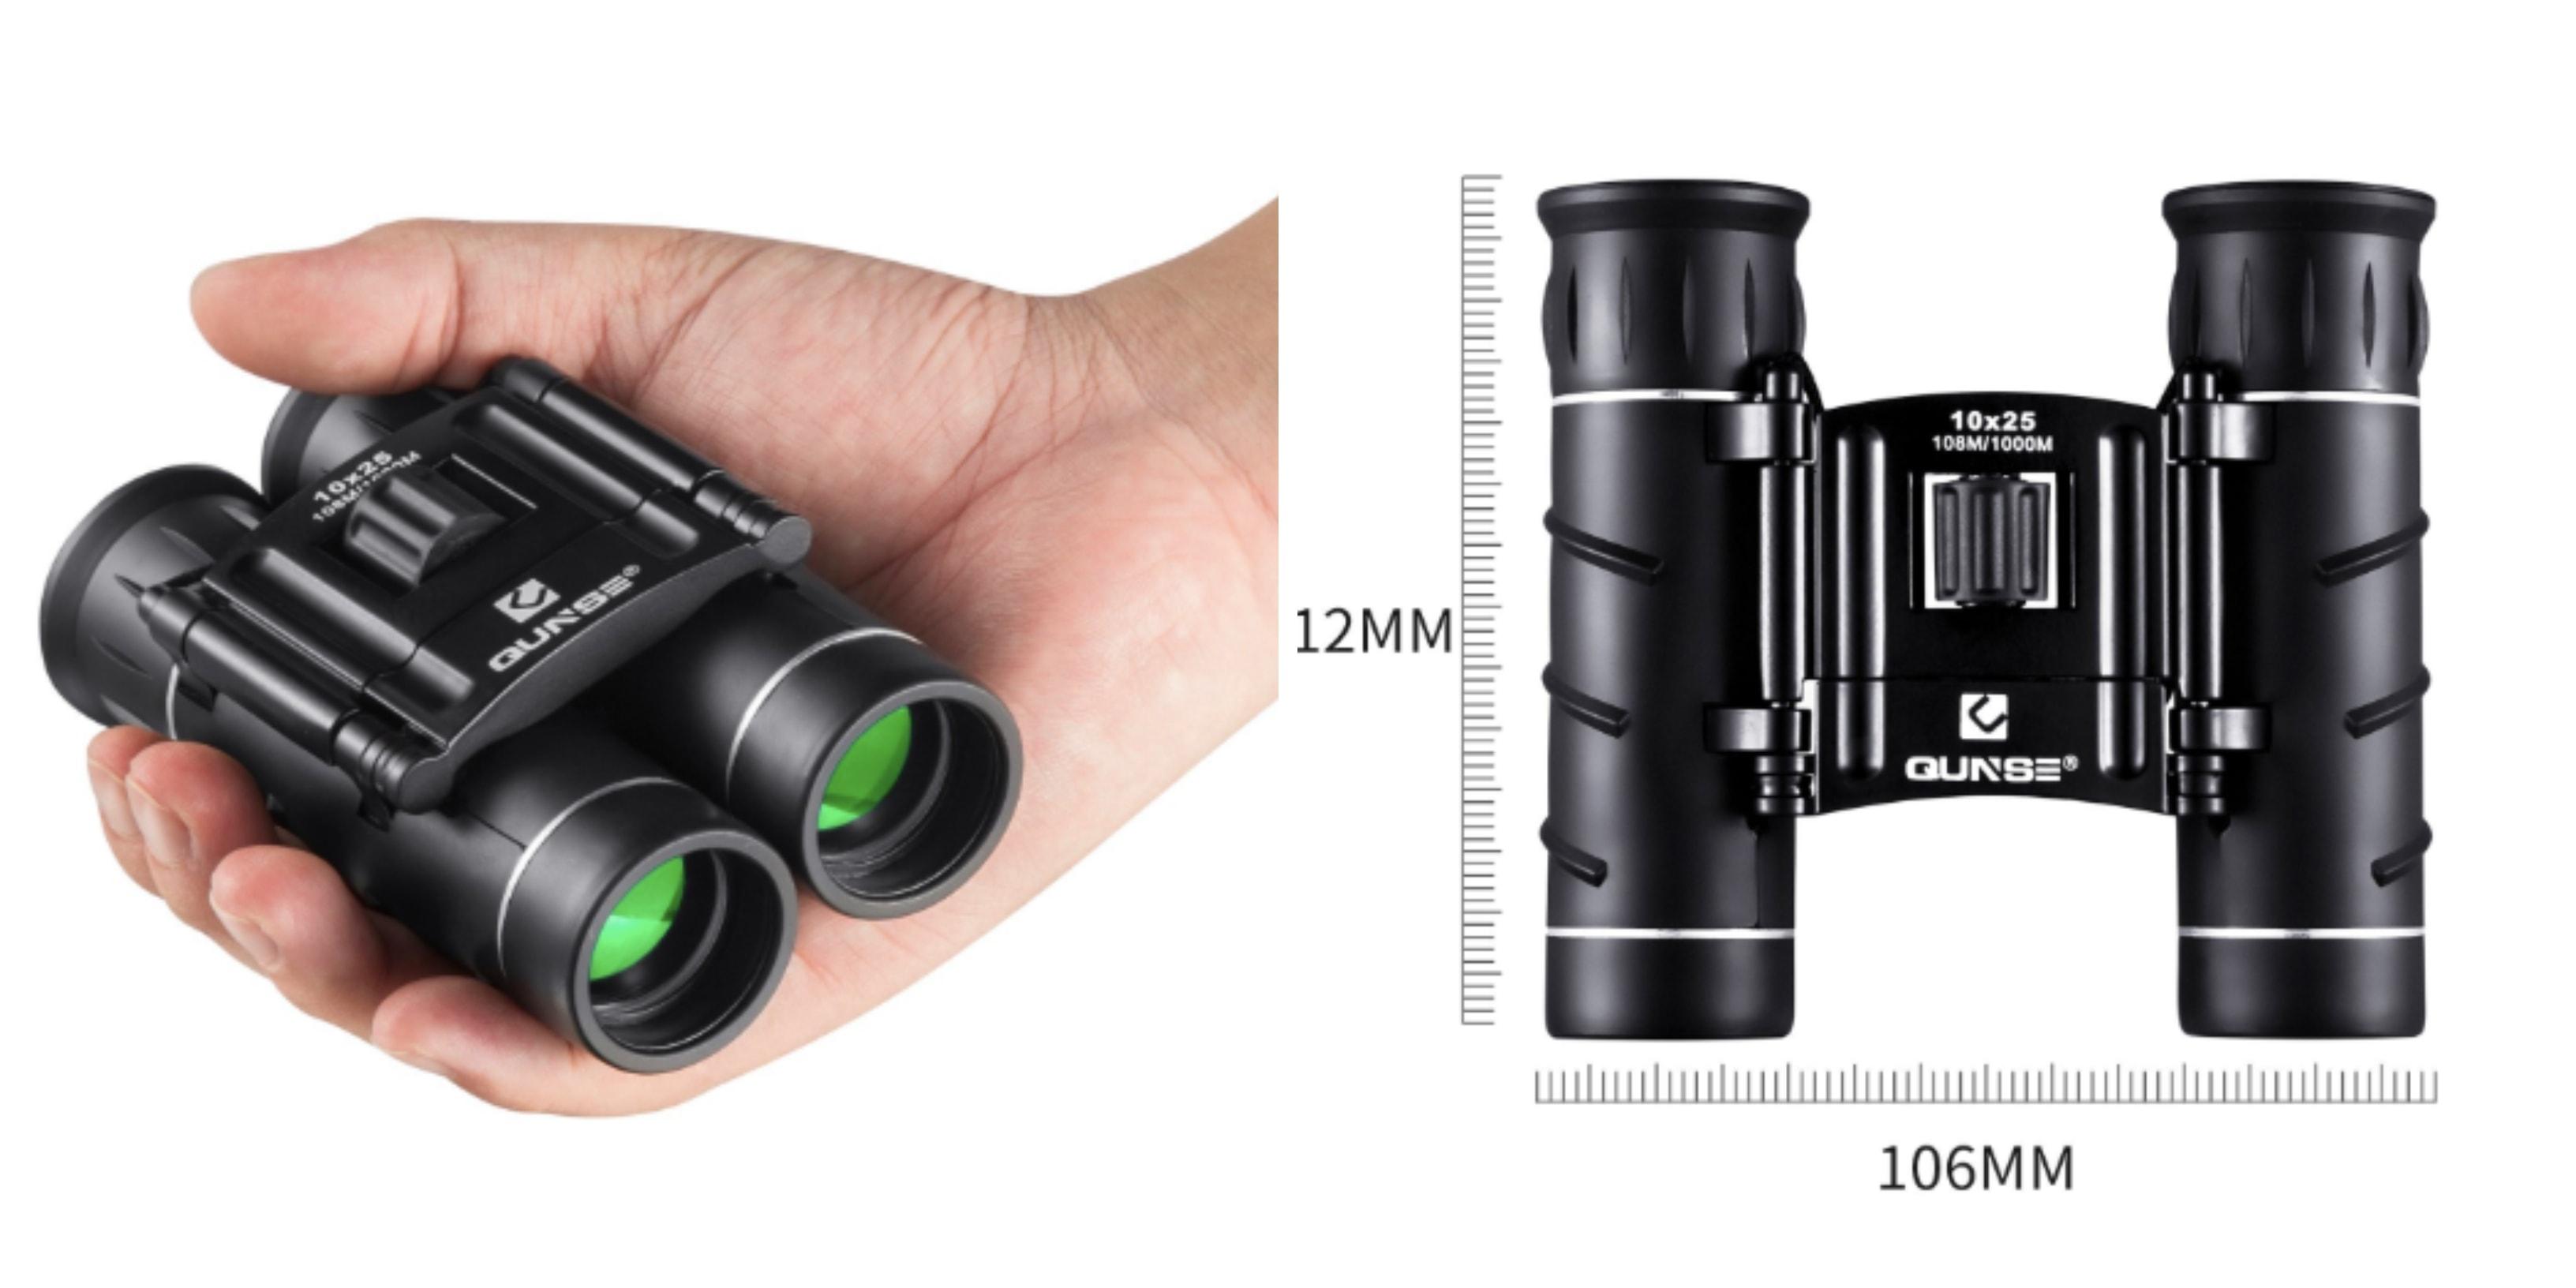 cruise gifts binoculars